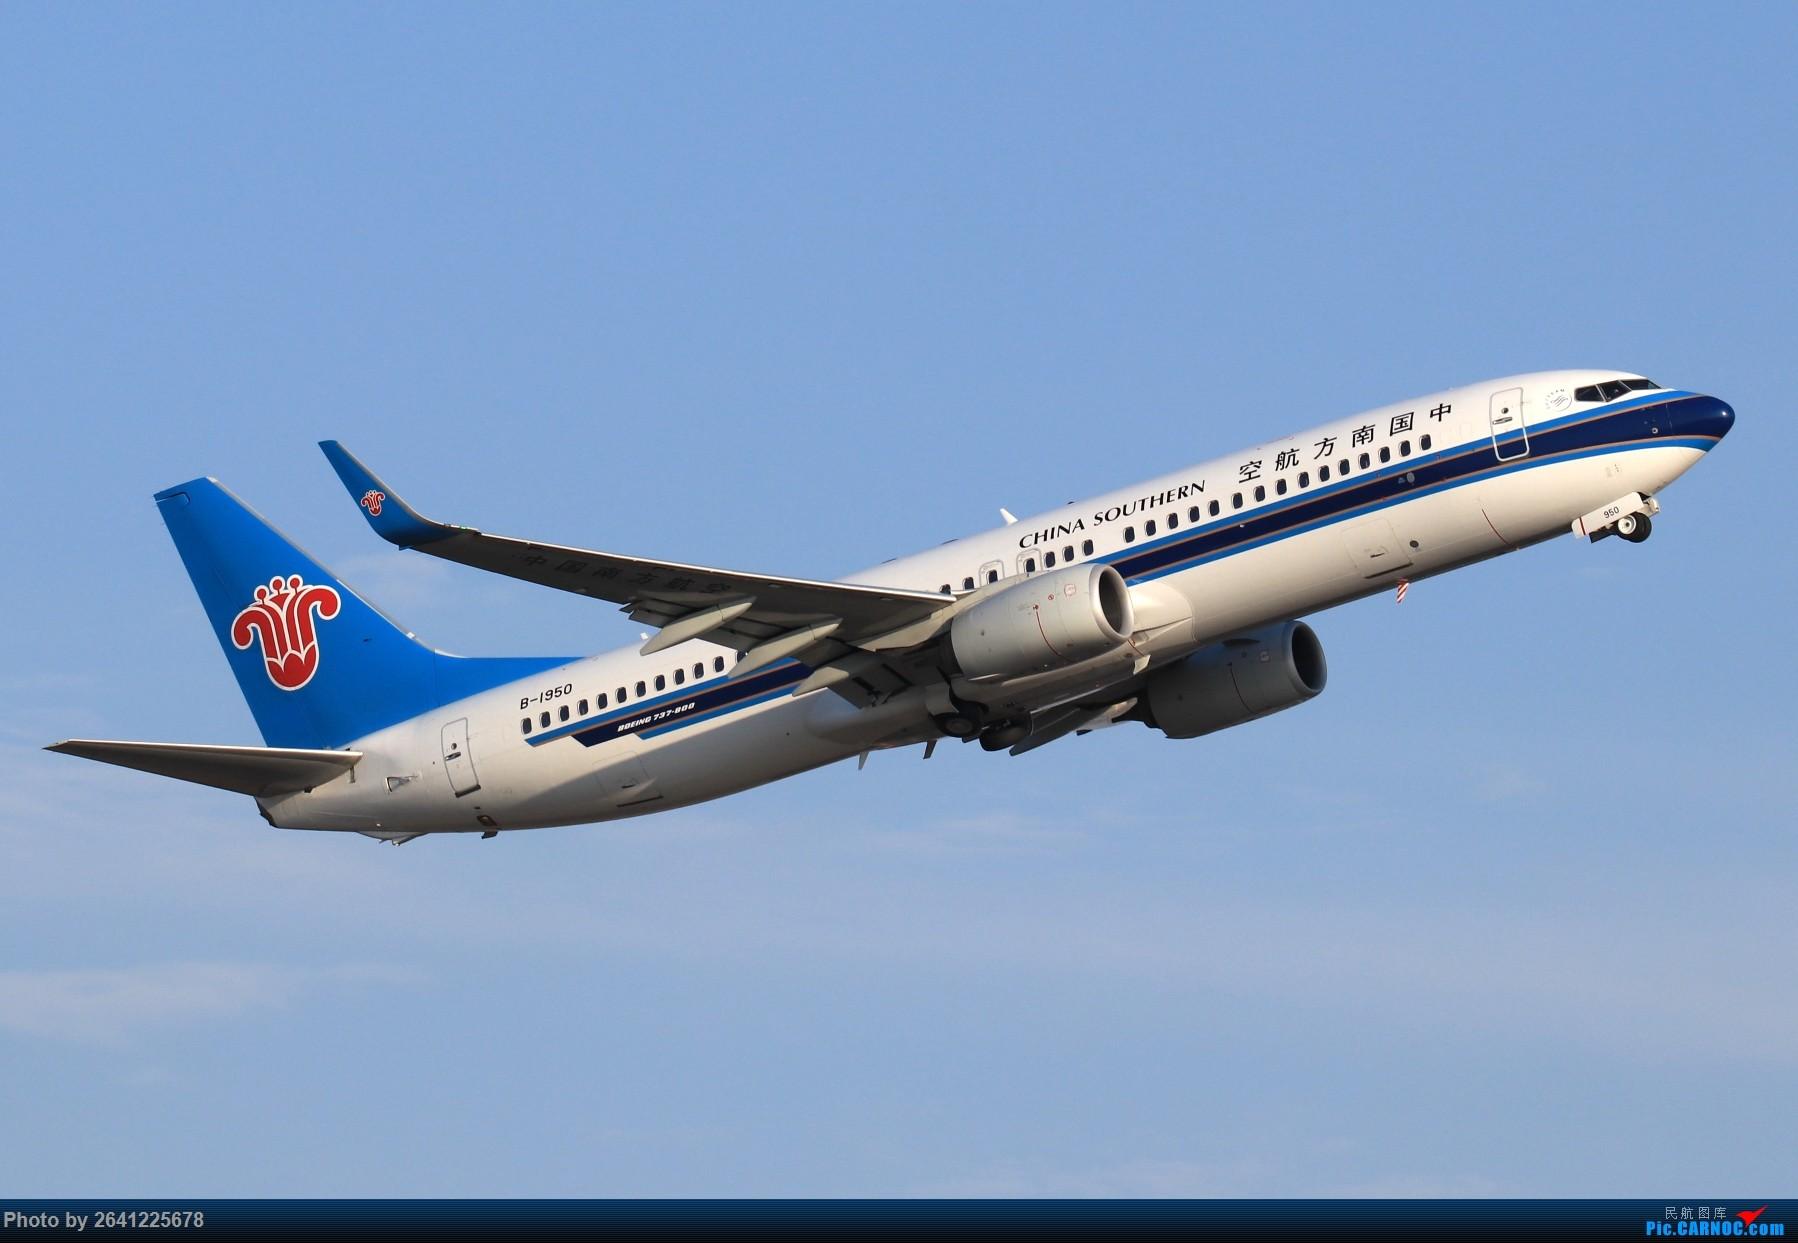 Re:[原创]【小周游记第7集拍机贴】乌鲁木齐绝美的地景和光线 BOEING 737-800 B-1950 中国乌鲁木齐地窝堡国际机场